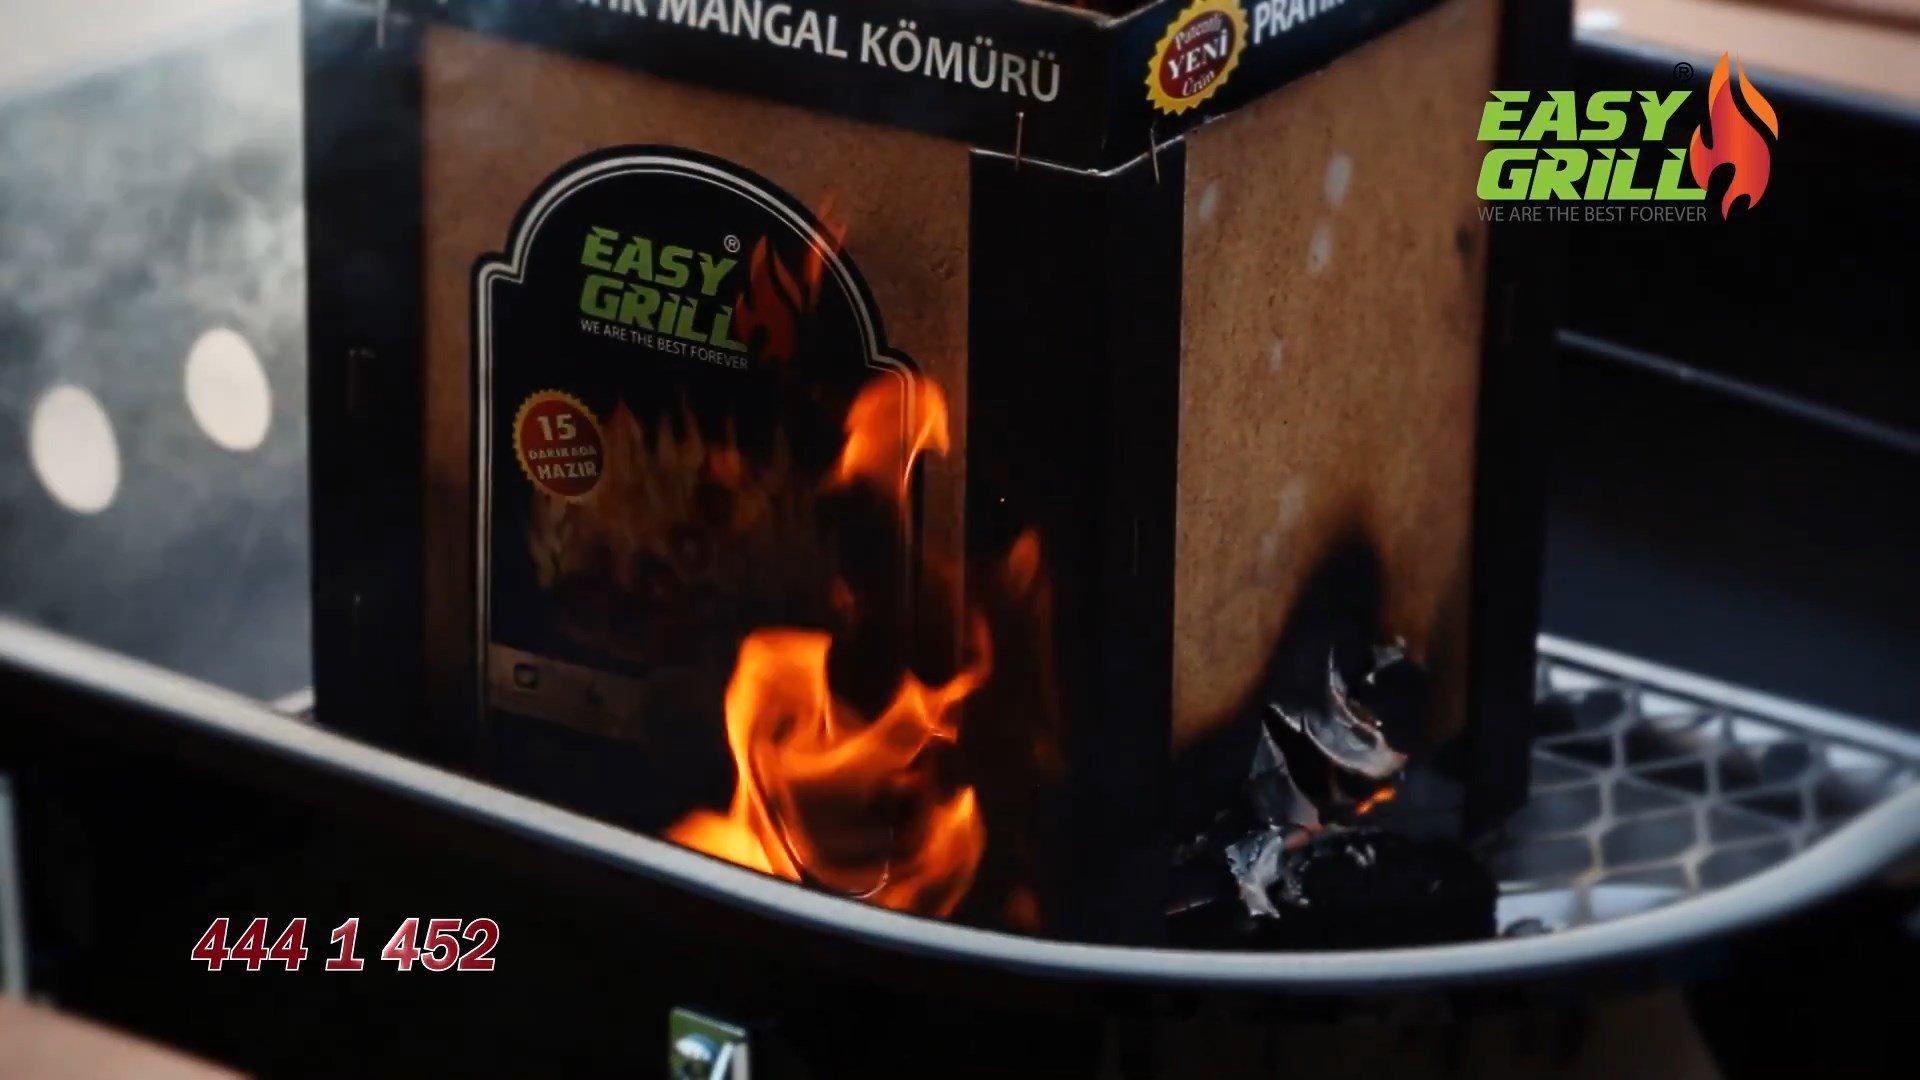 Easy Grill Tanıtım Filmi 8 1920x1080 - Easy Grill Tanıtım Filmi